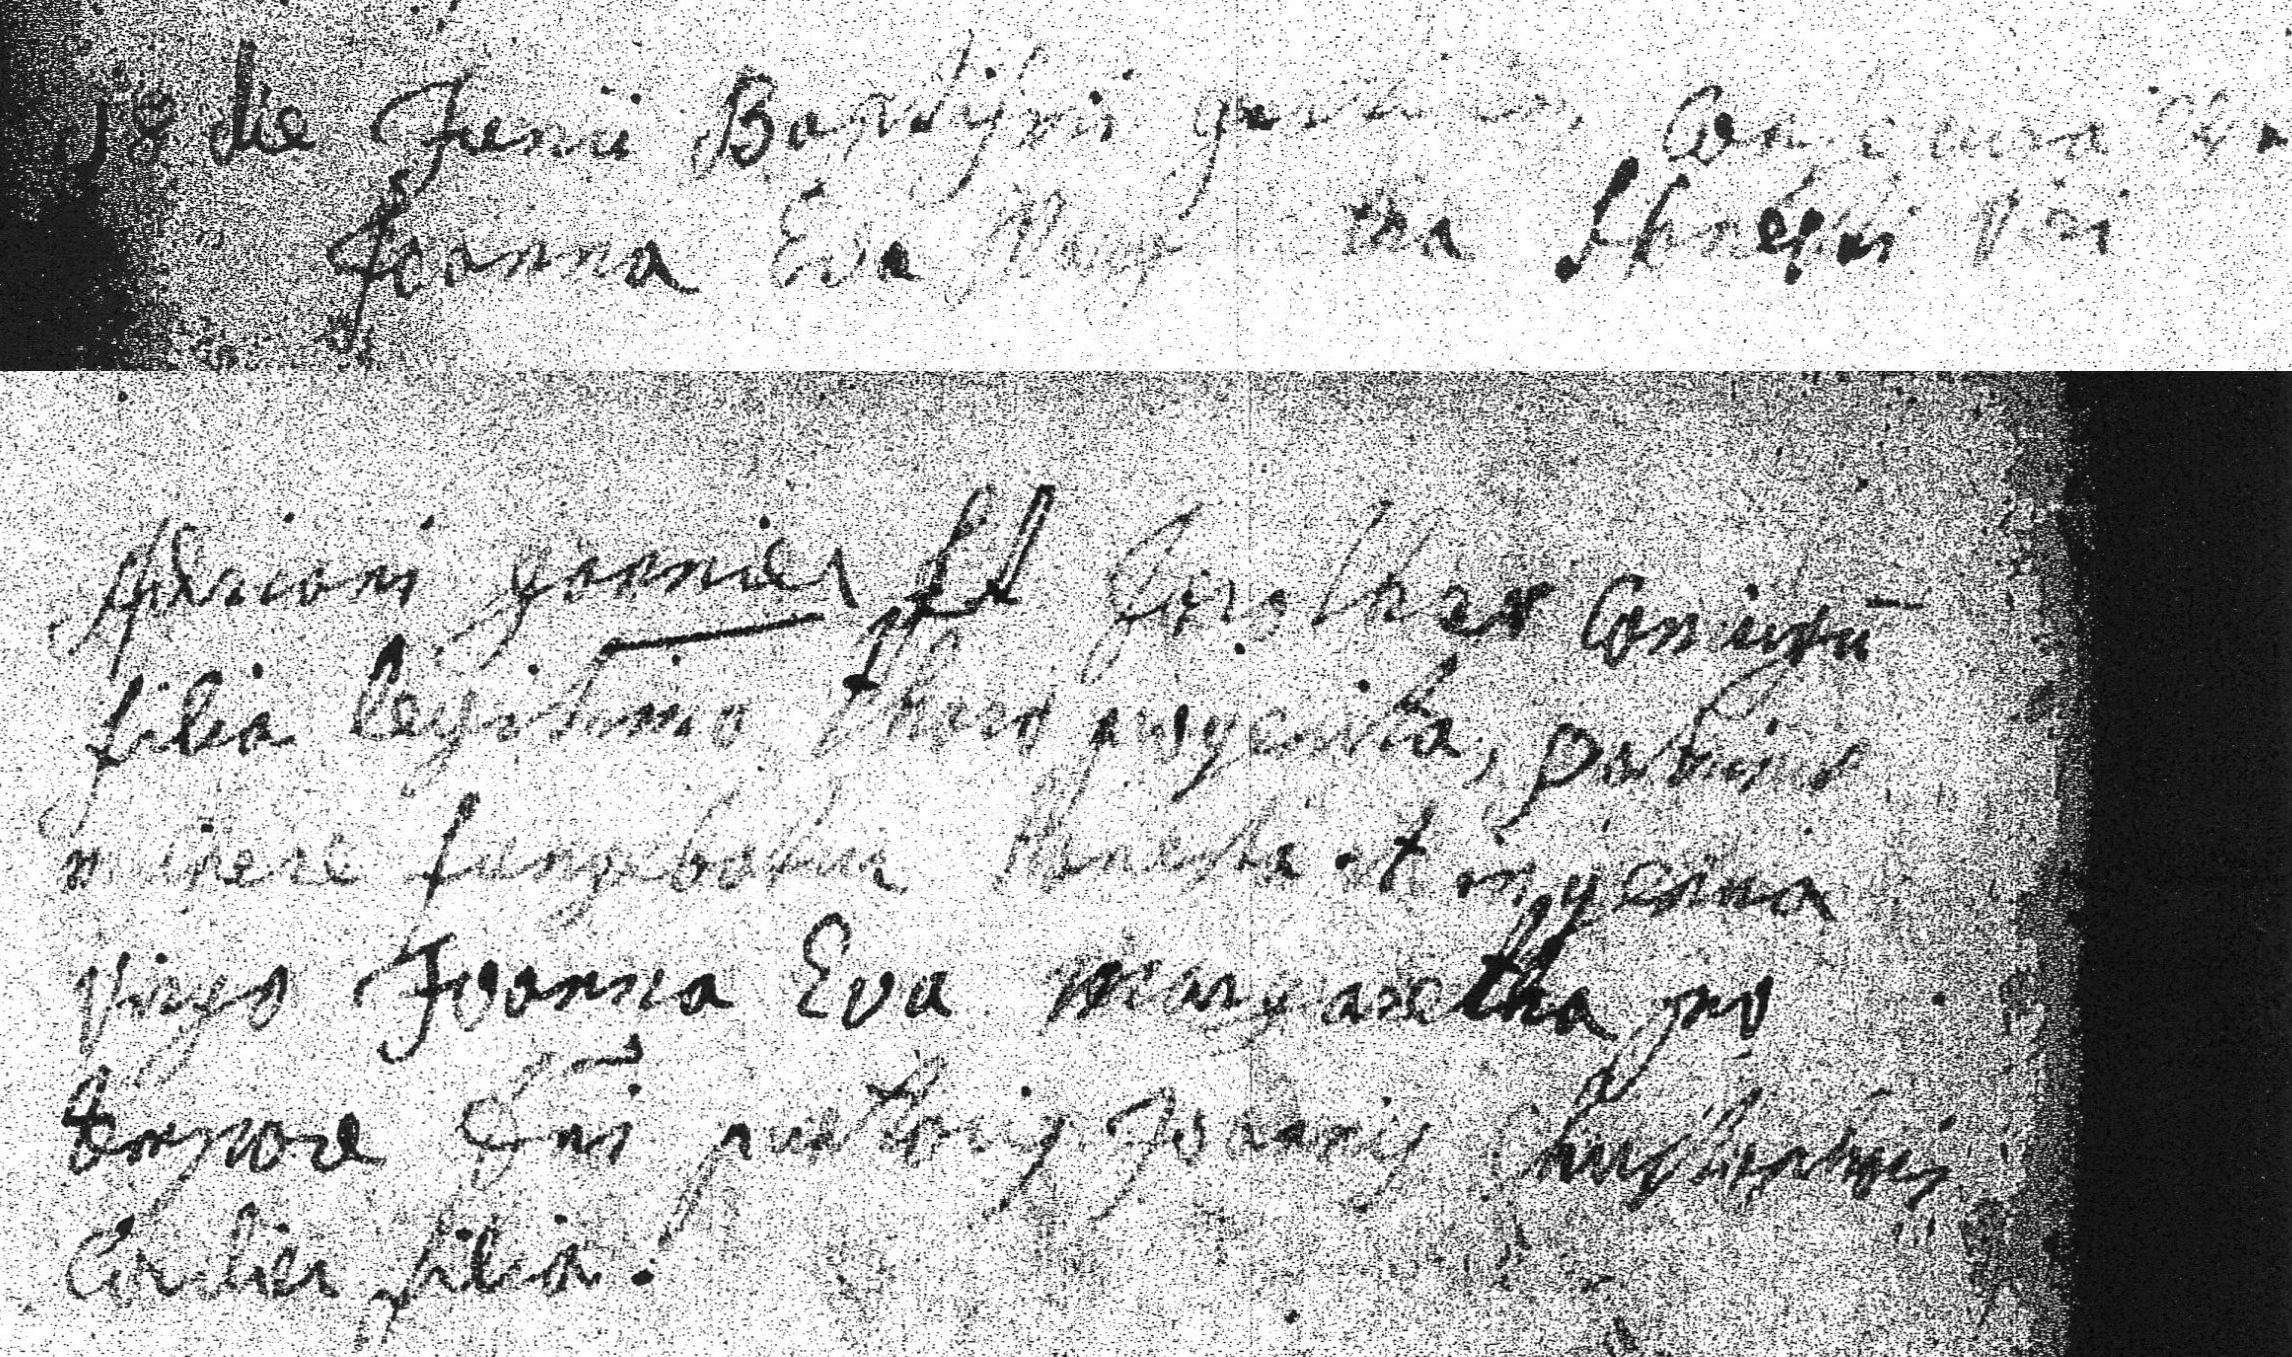 Joanna Eva Margaretha Ganier